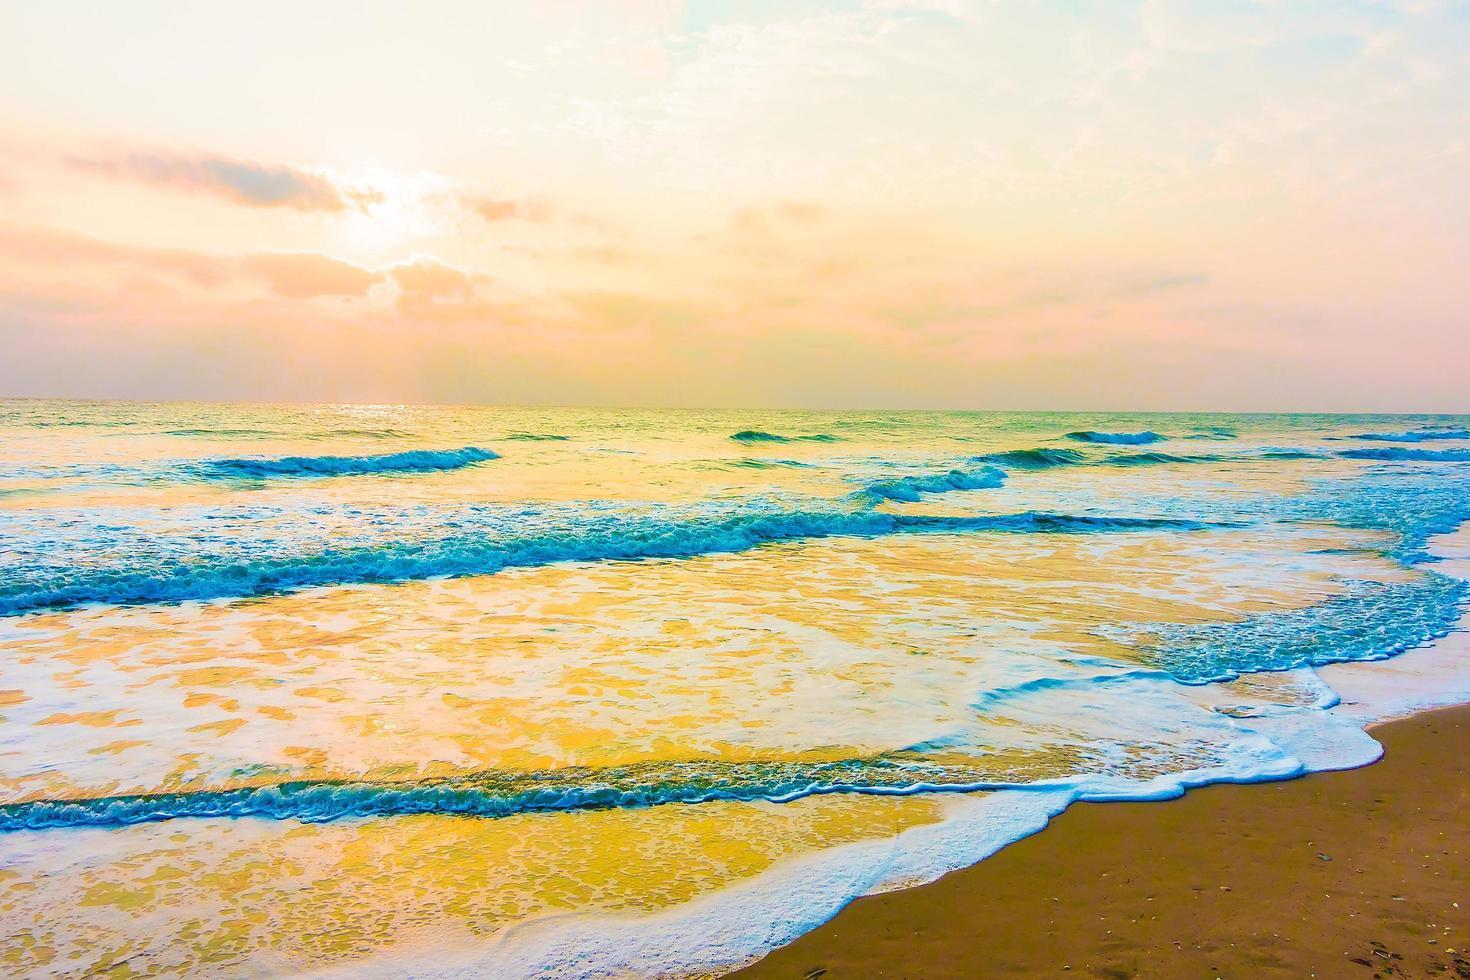 vintage mer et plage photo